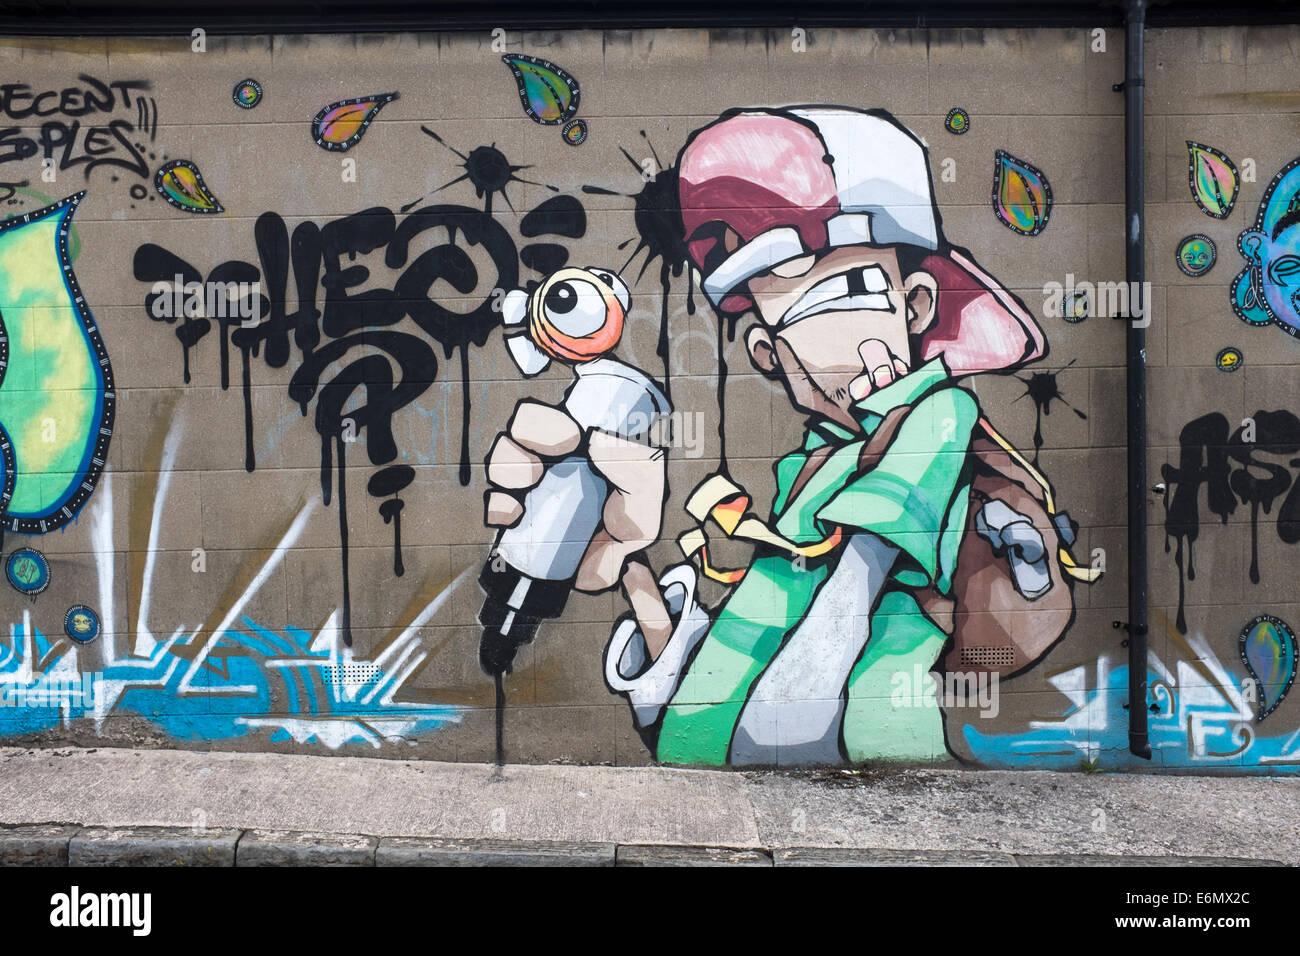 Street Art or Urban Graffitti in Stokes Croft Bristol - Stock Image